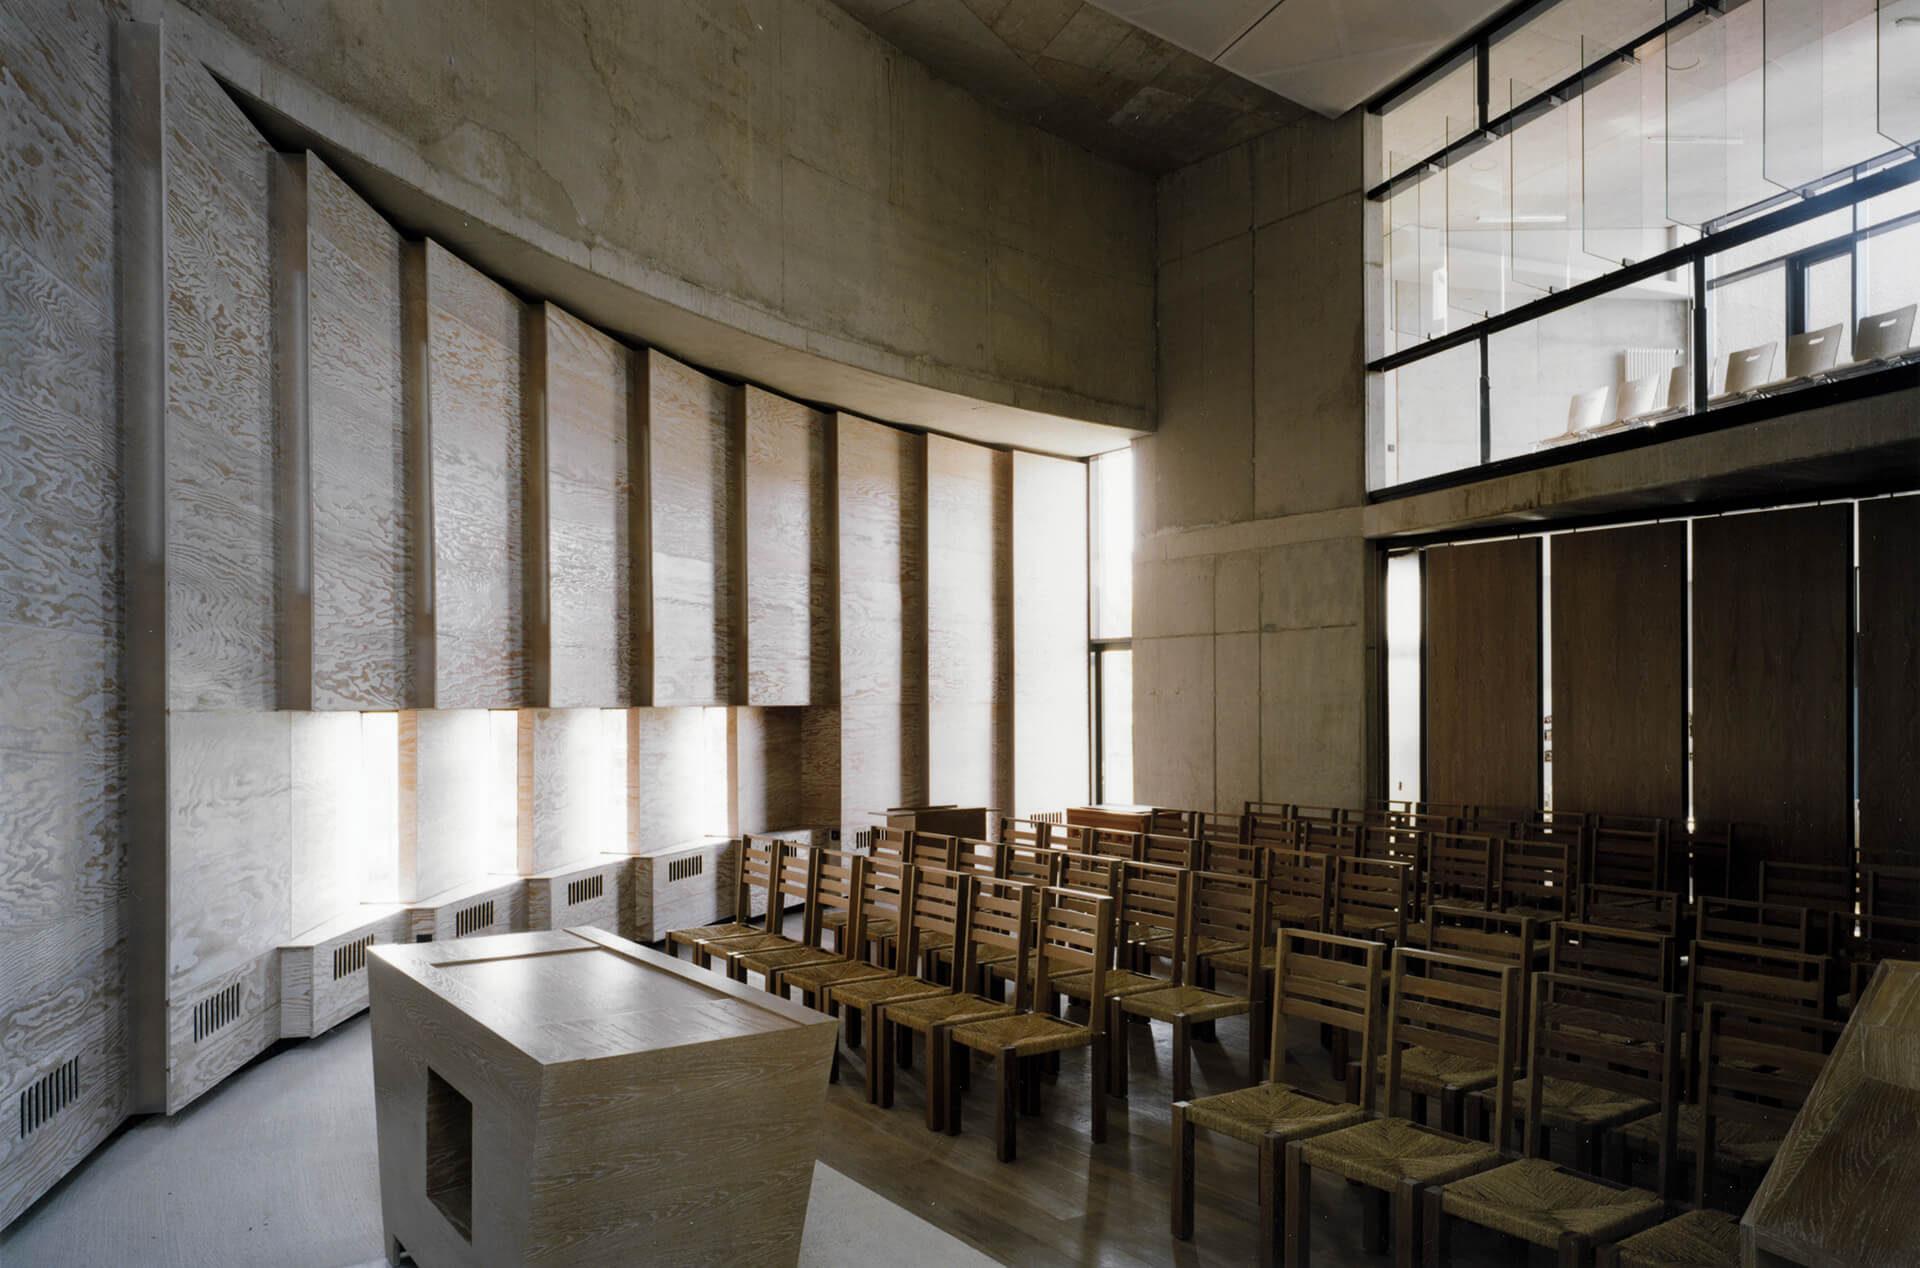 ksg architekten pauluskirche k ln porz. Black Bedroom Furniture Sets. Home Design Ideas